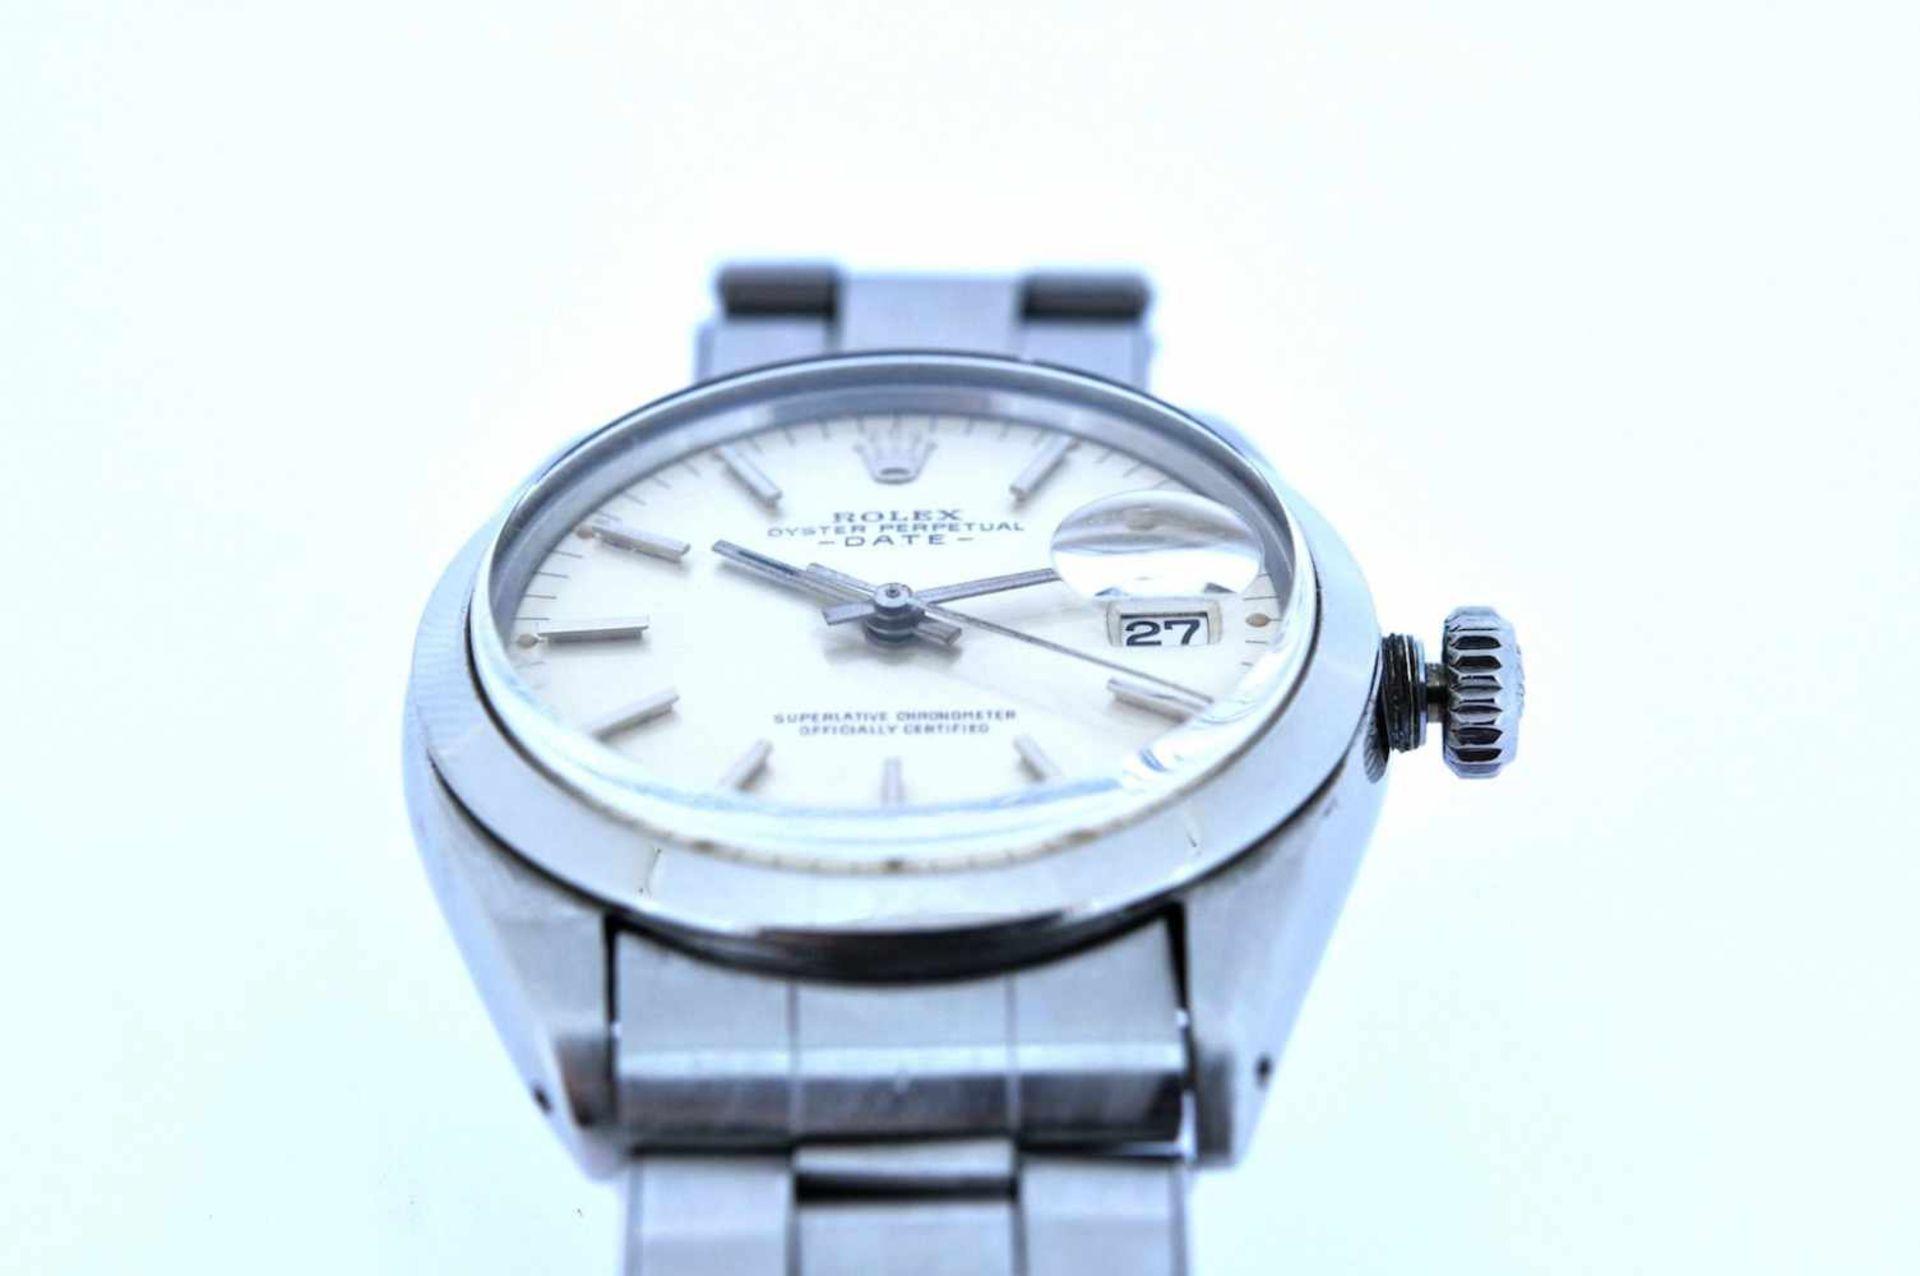 Los 7 - Rolex Rolex Date Precision, Ref.1500, Stahl/Stahl, Oysterband, Handaufzug, Plexiglas Rolex Rolex